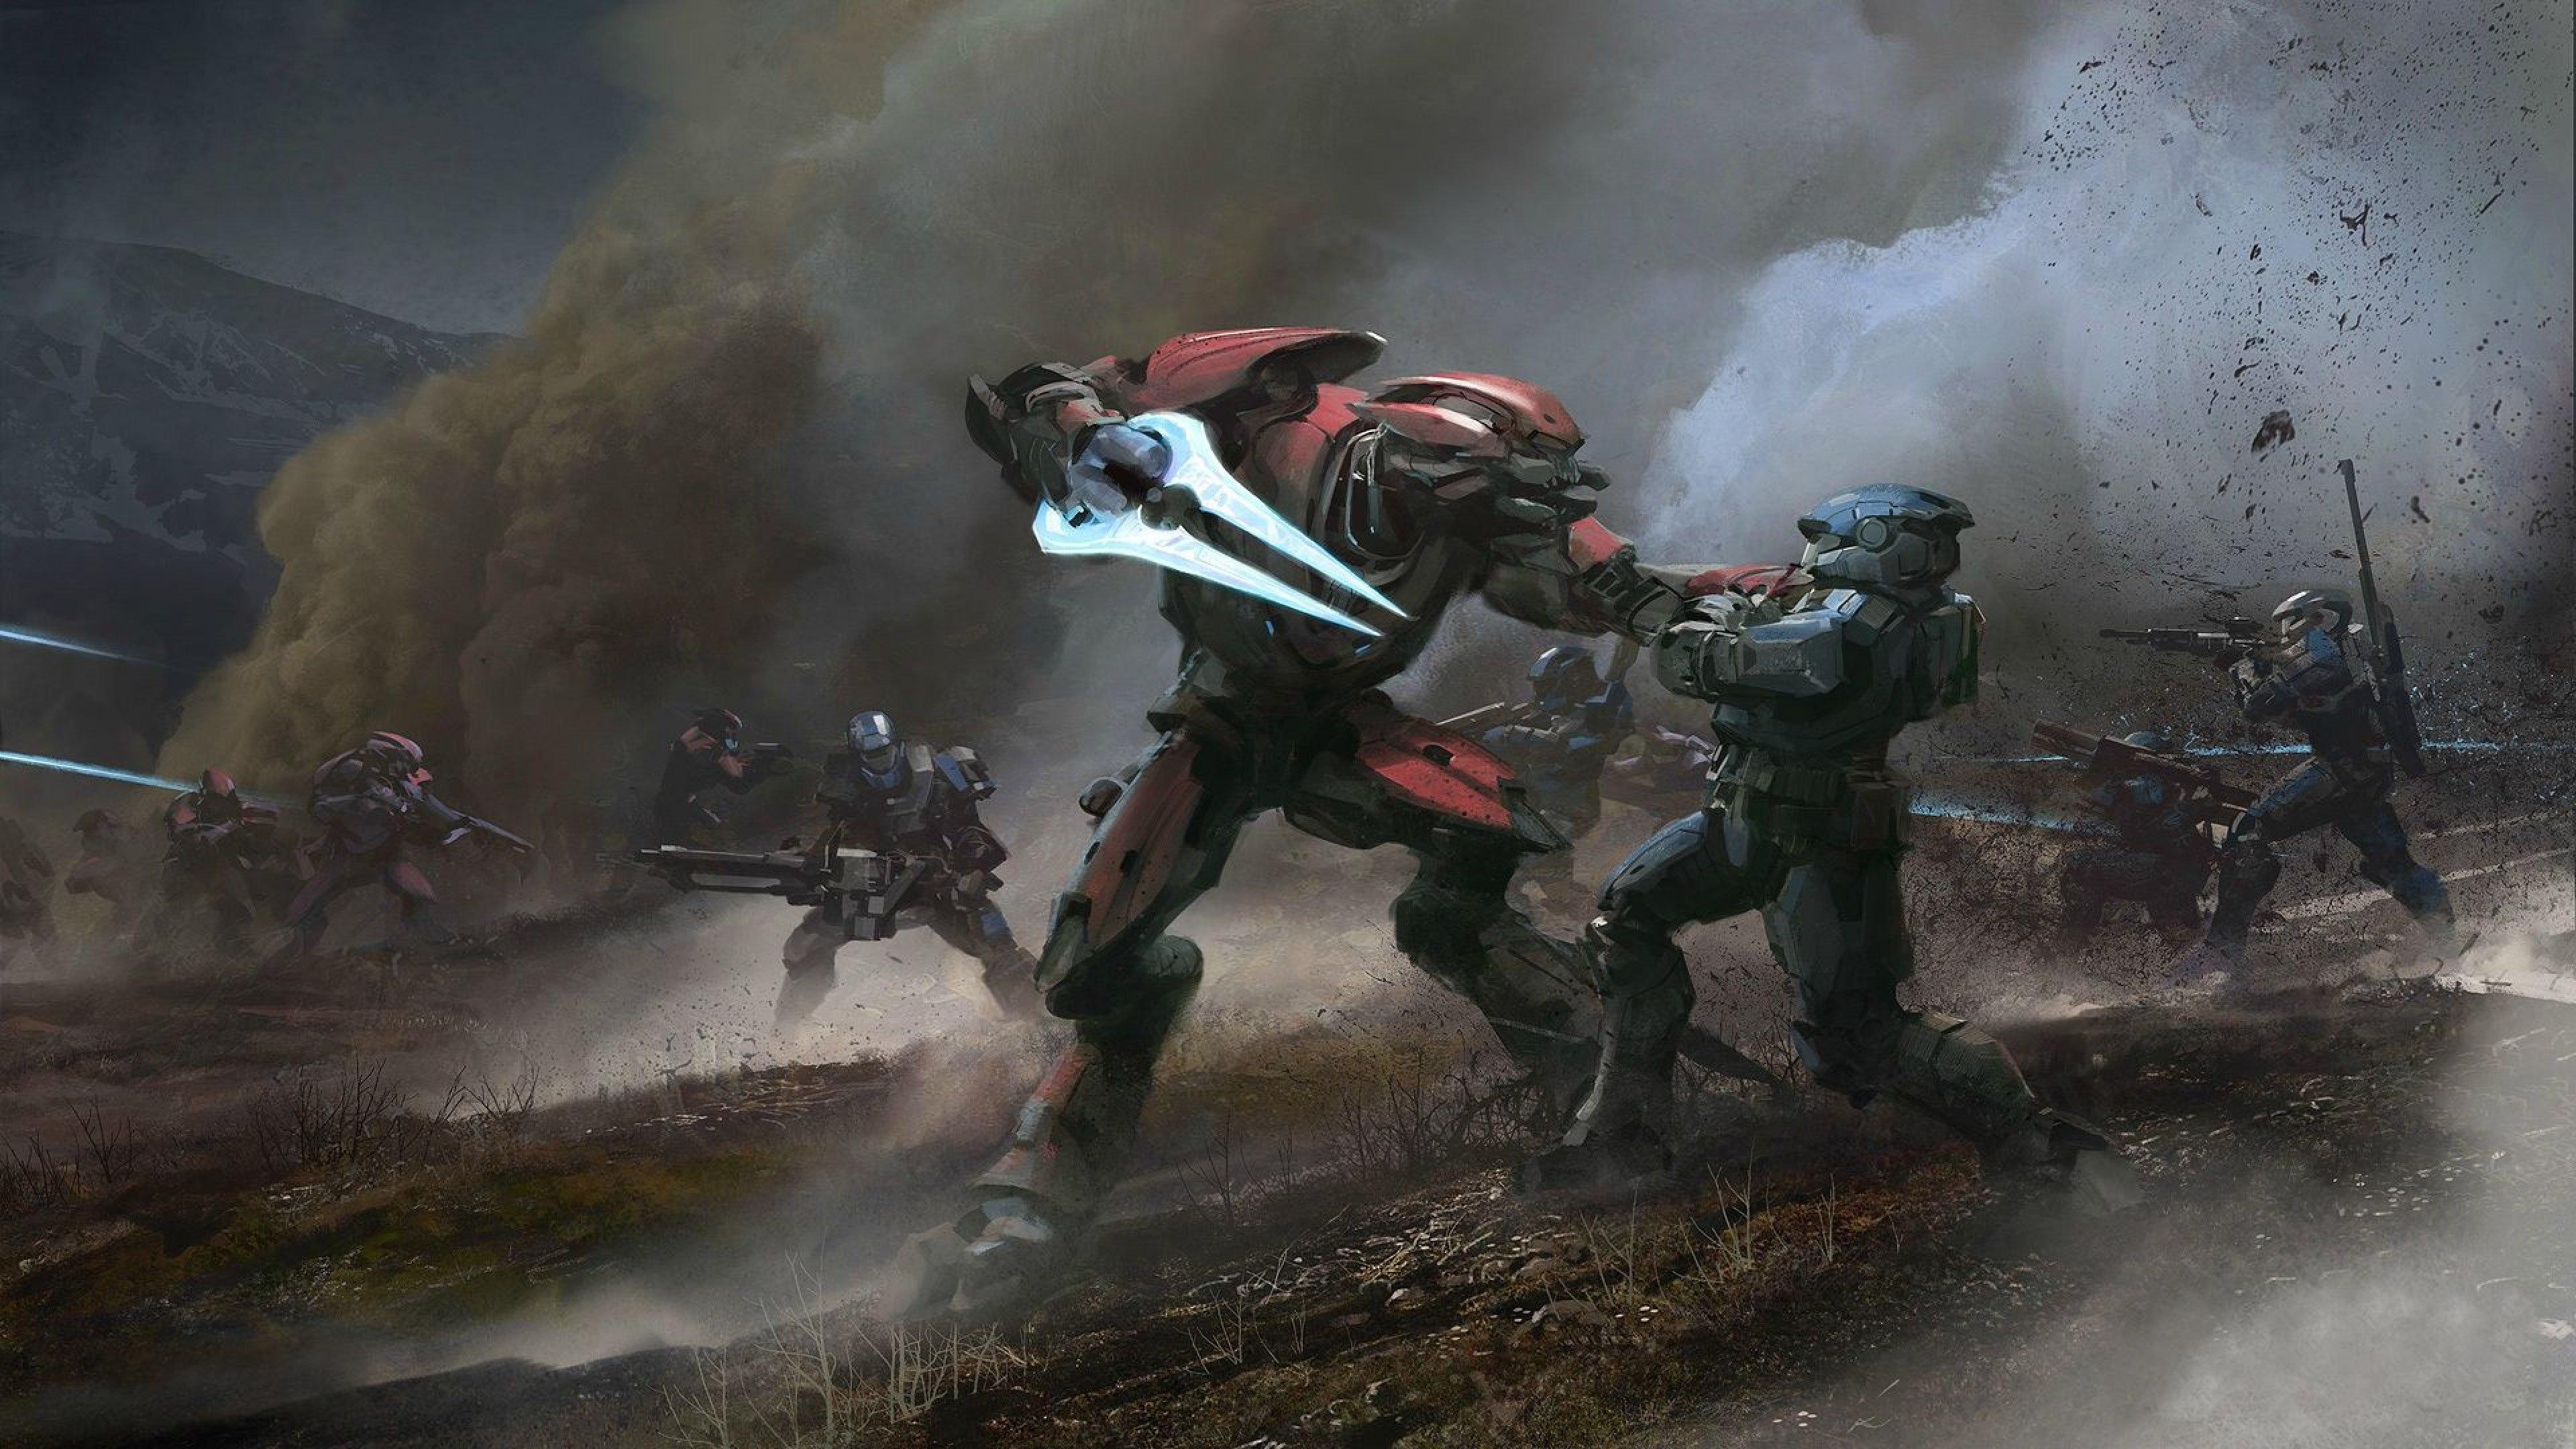 halo_reach_elite_battle_spartan_92816_3840x2160